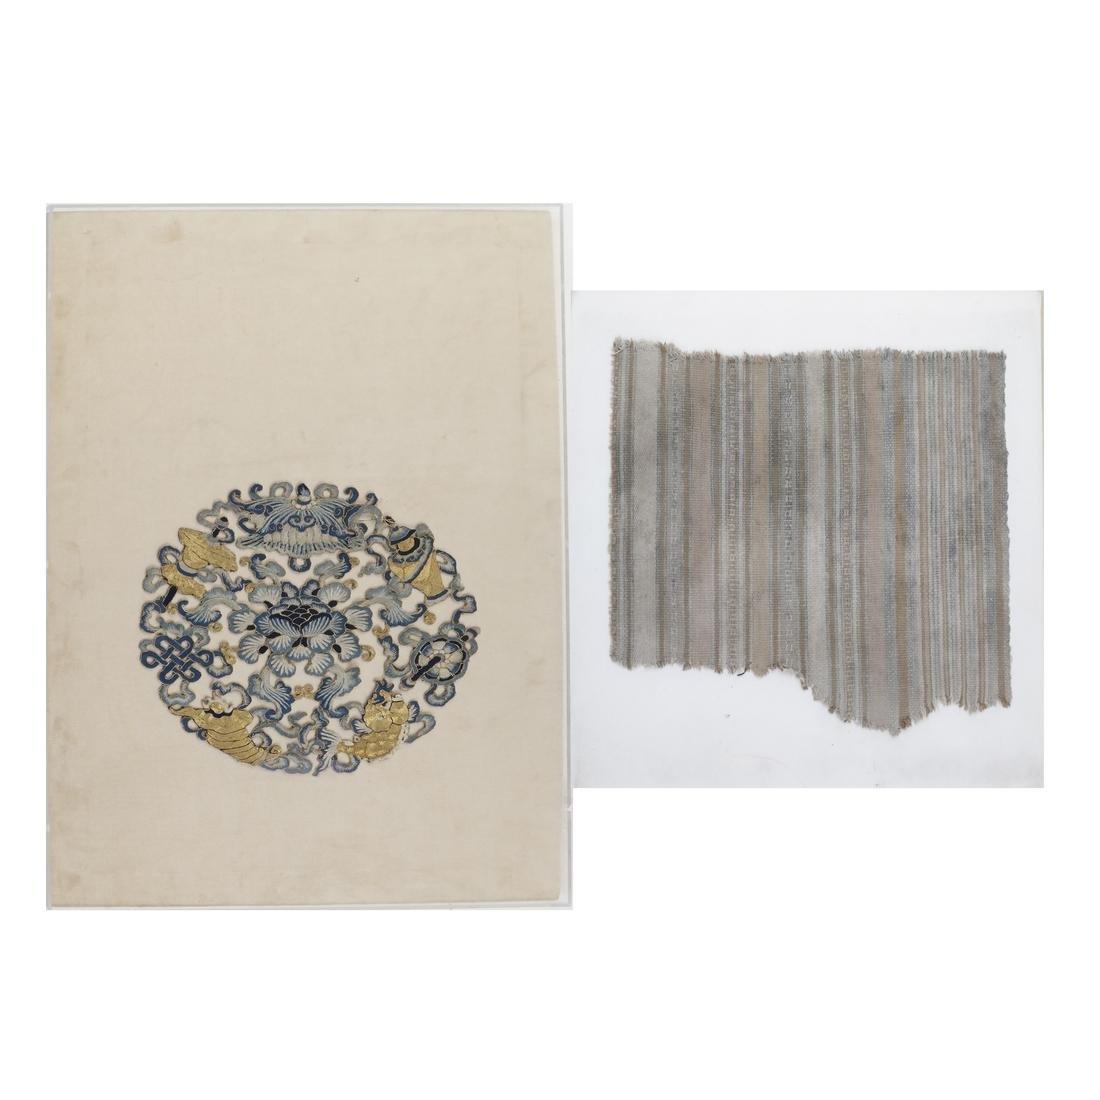 Two Antique Asian Textiles